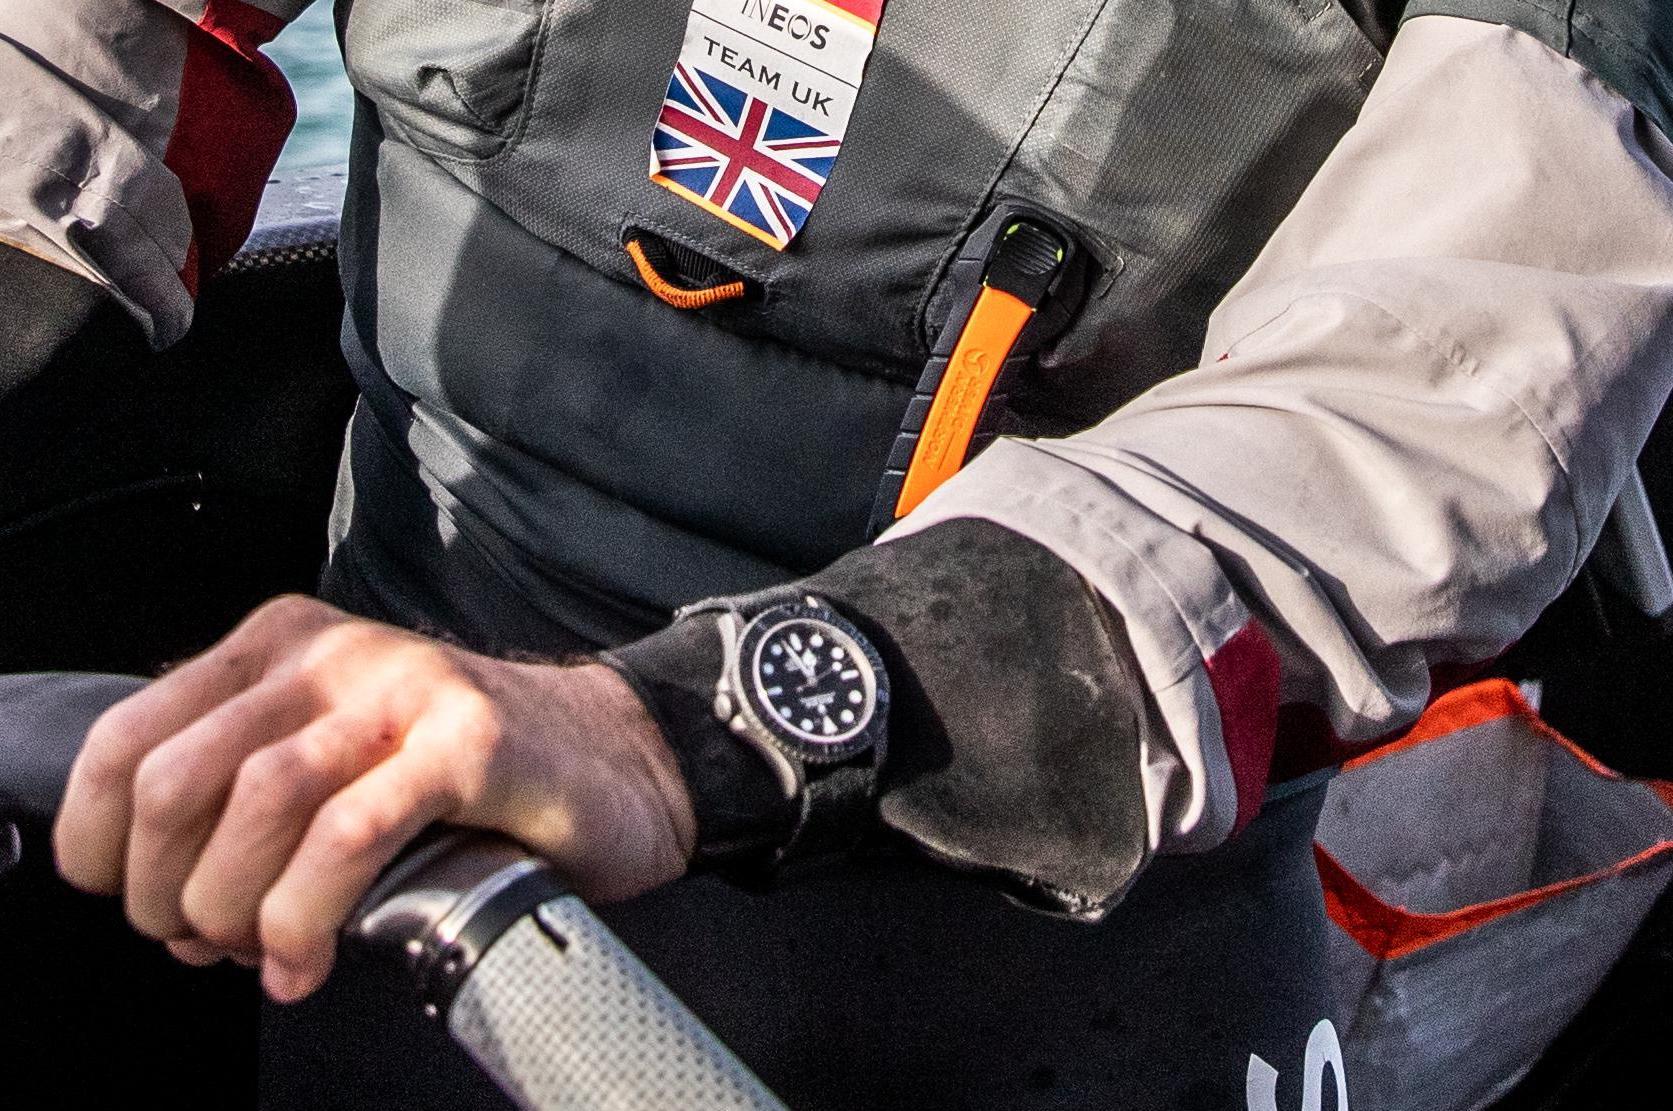 Spotted - Rolex Yacht-Master 42 Titanium No-Date Prototype Worn by Sir Ben Ainslie